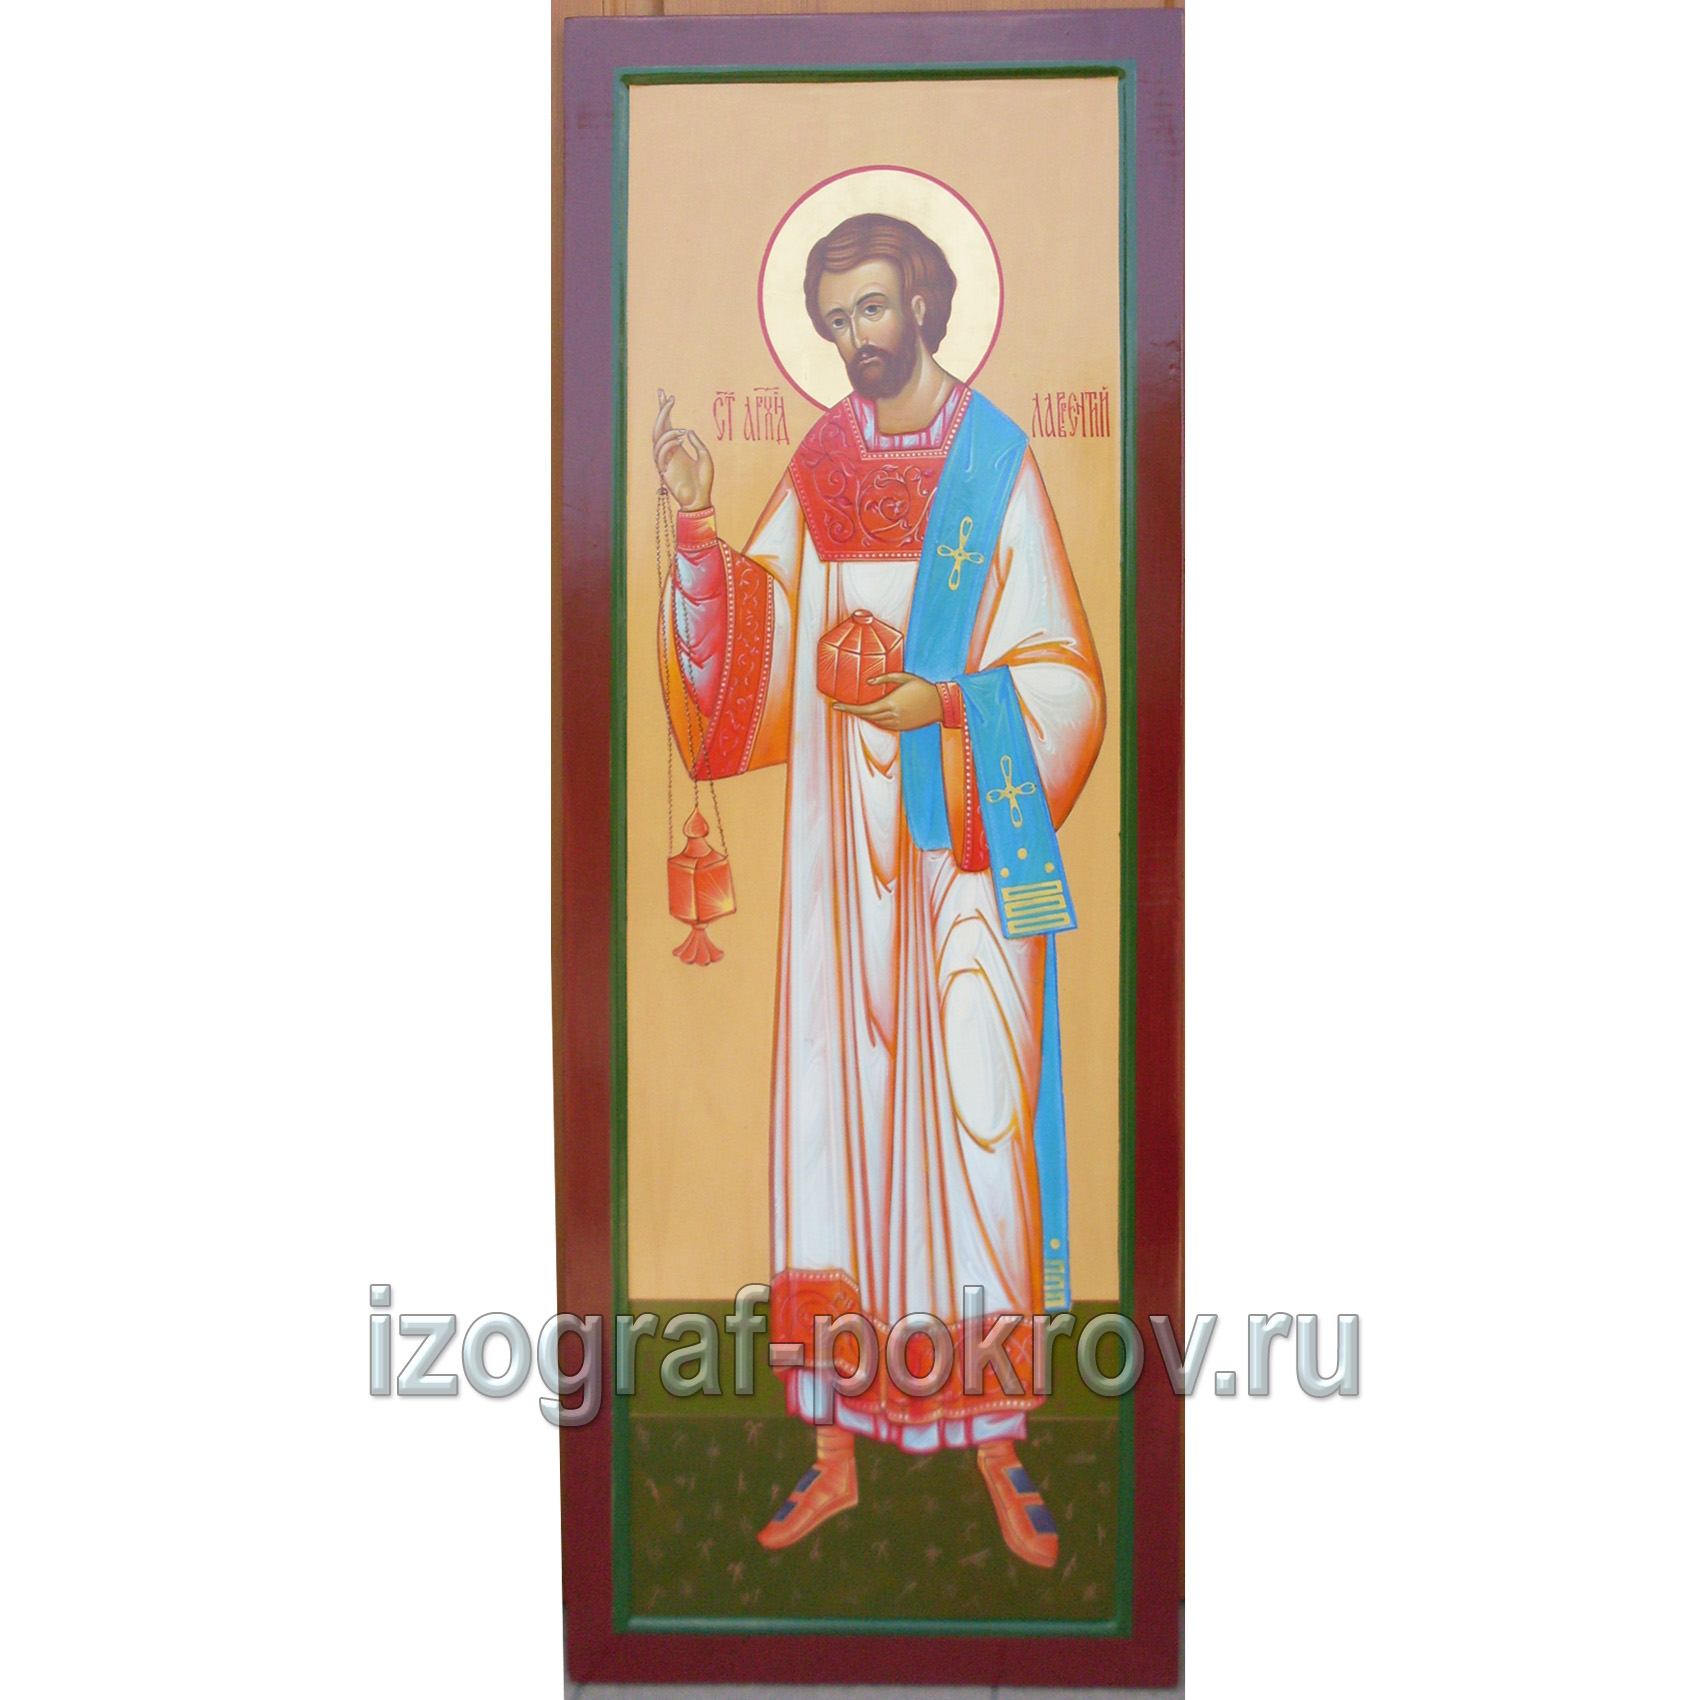 Икона Лаврентий Римский Архидиакон сщмч